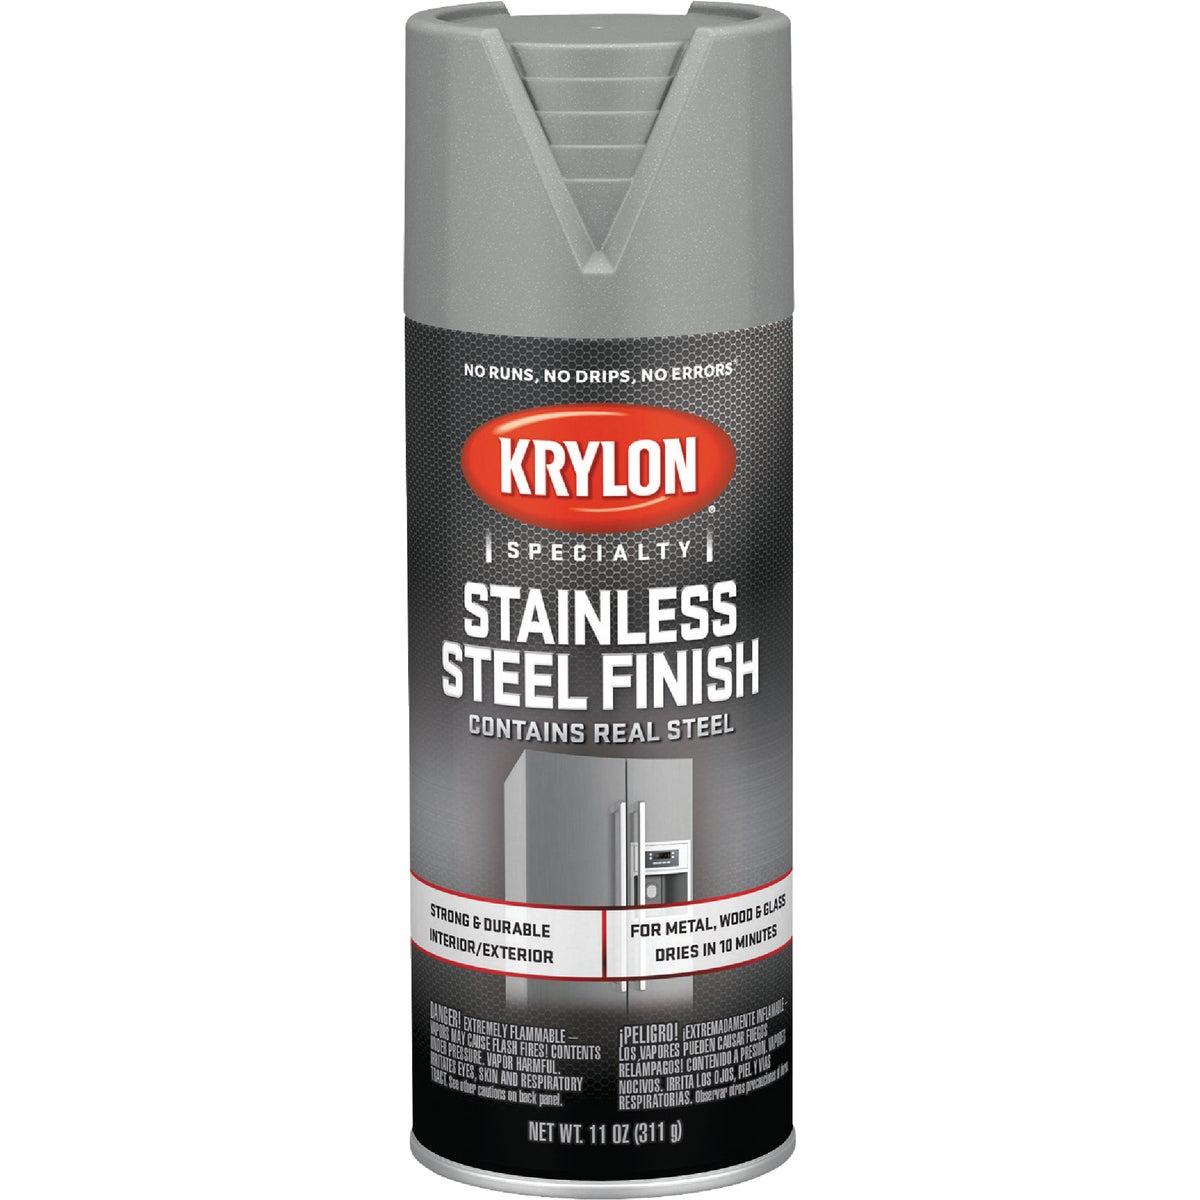 STNLS STEEL SPRAY PAINT - 2400 by Krylon/consumer Div